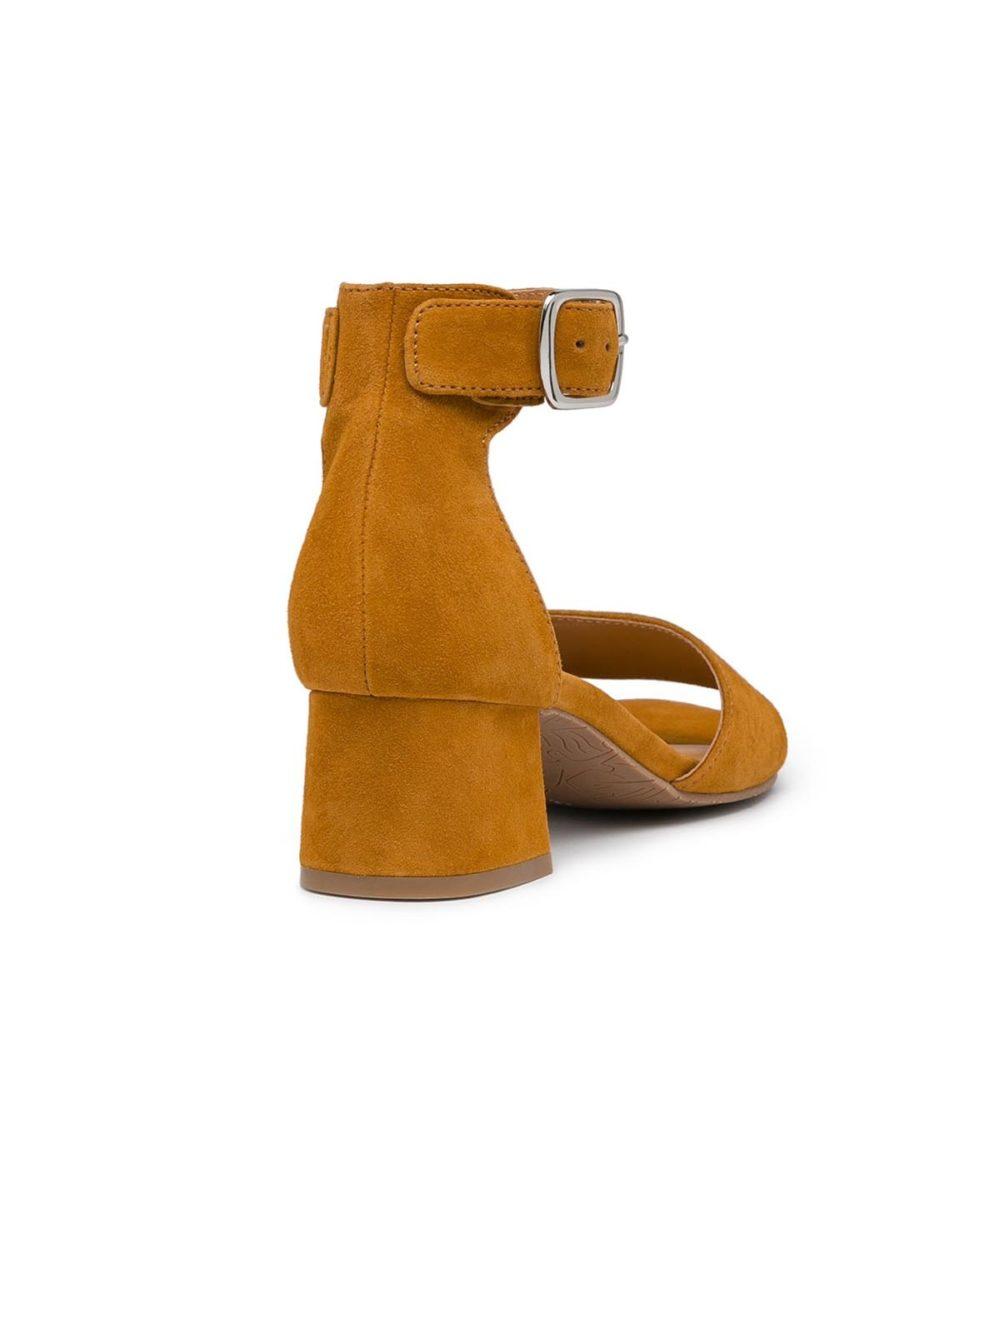 Catty Sandal Regarde le Ciel Katie Kerr Women's Clothing